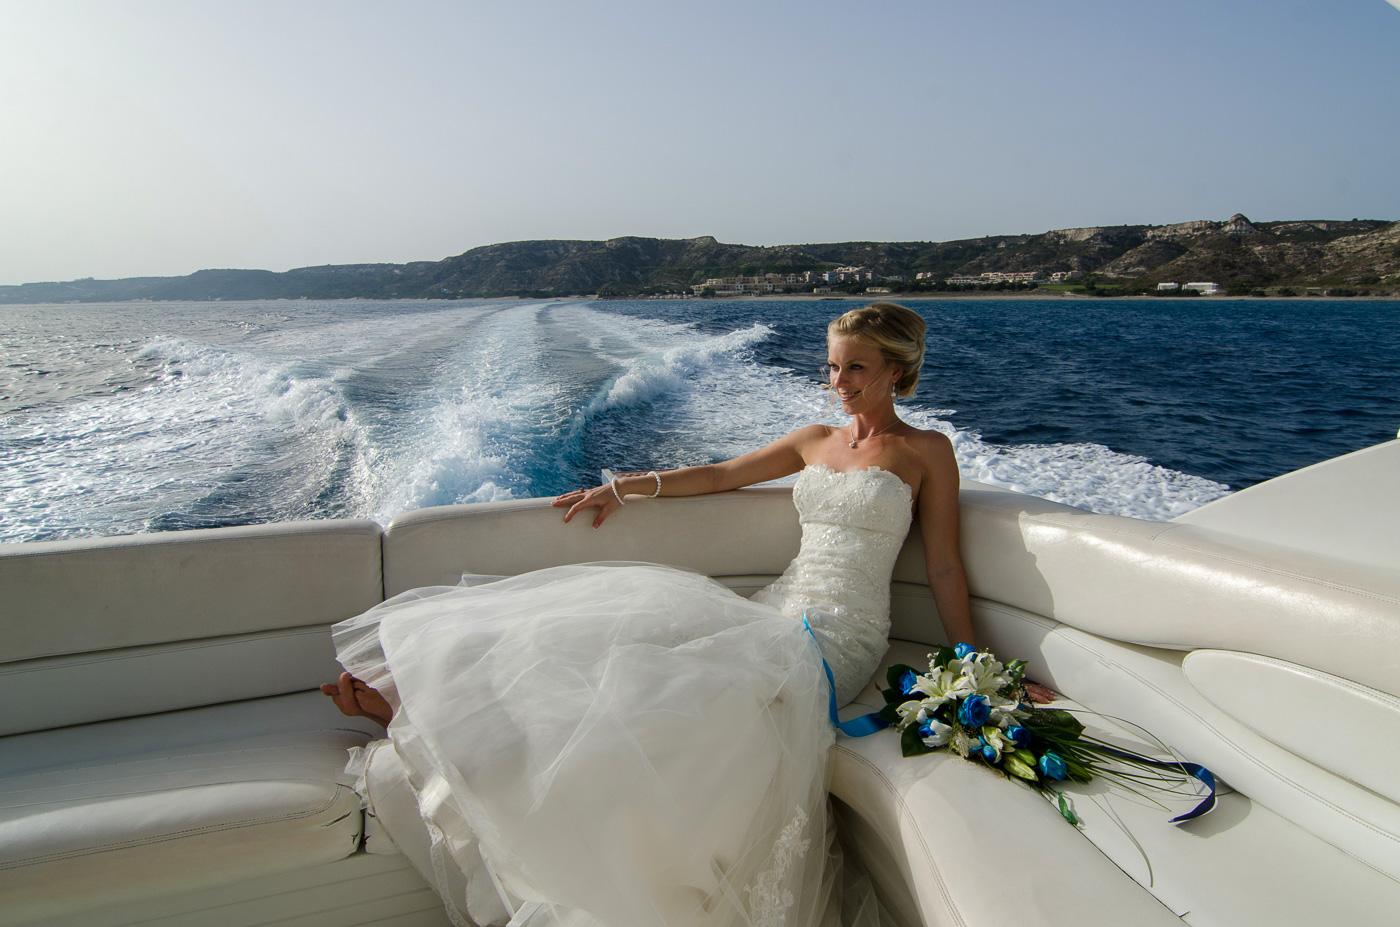 Kos island, Rhodes, Santorini, Mykonos, Kalymnos, Telendos, Crete